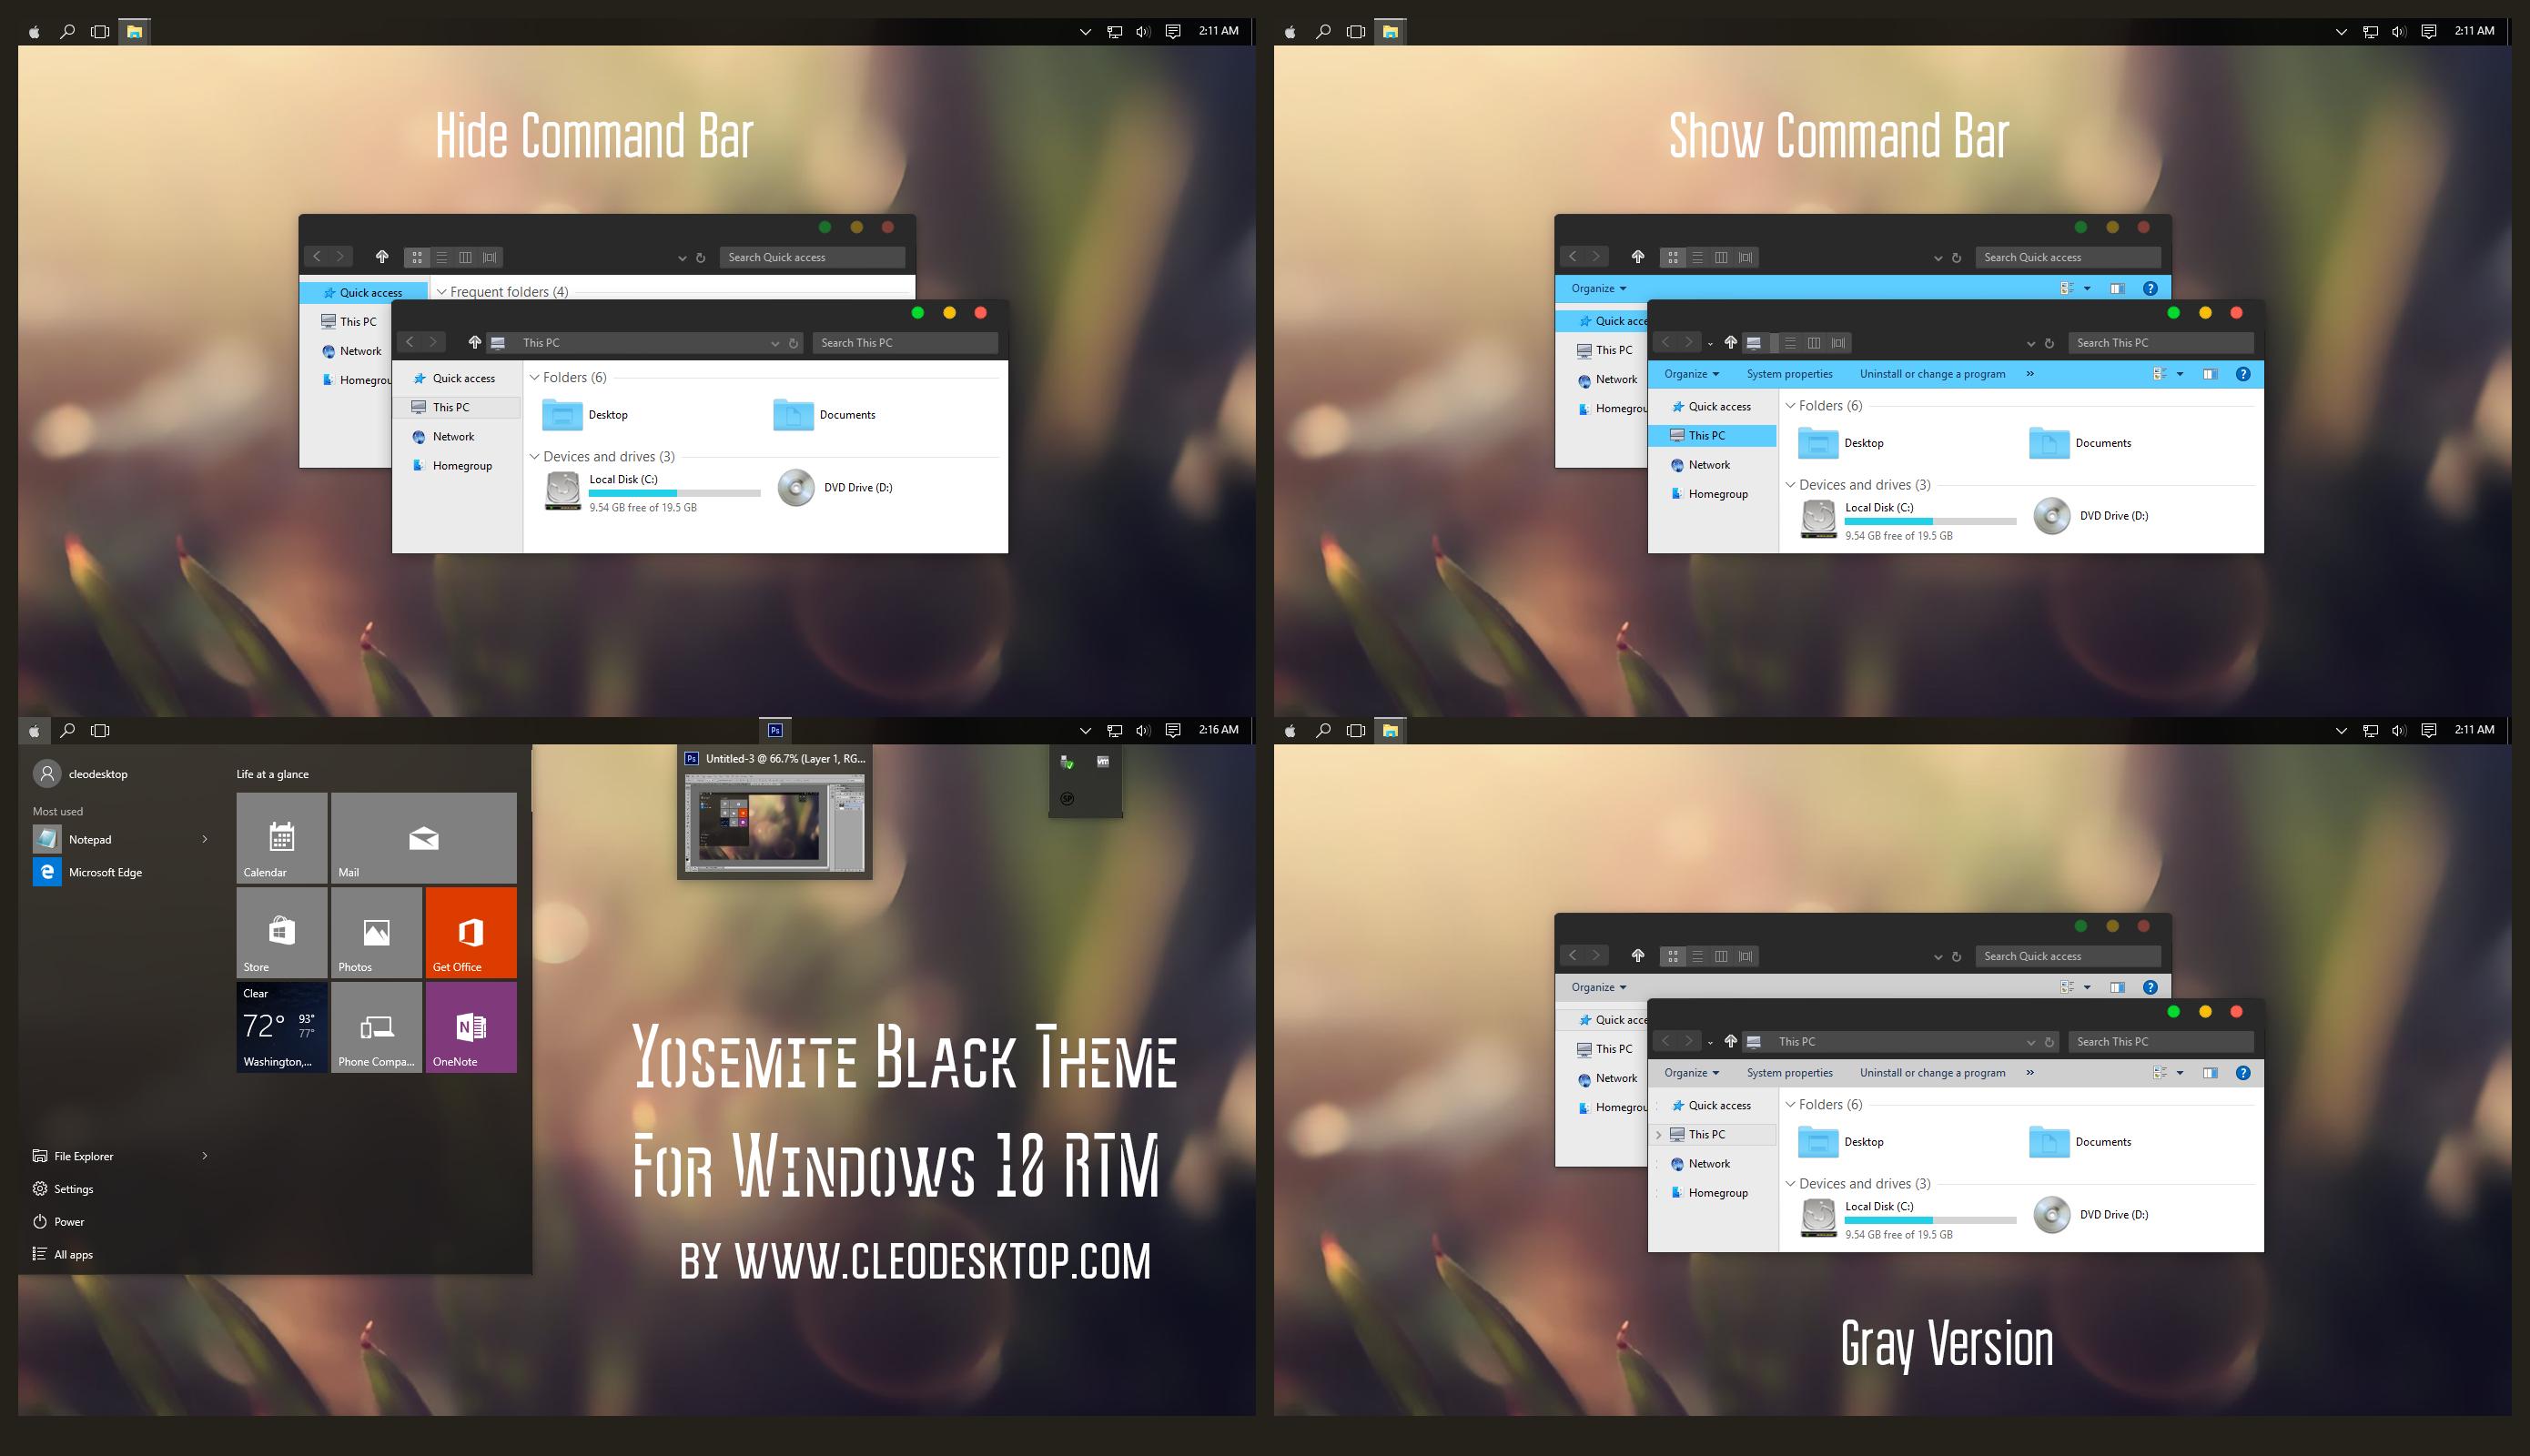 Yosemite Black Full Version Theme Windows 10 RTM by cu88